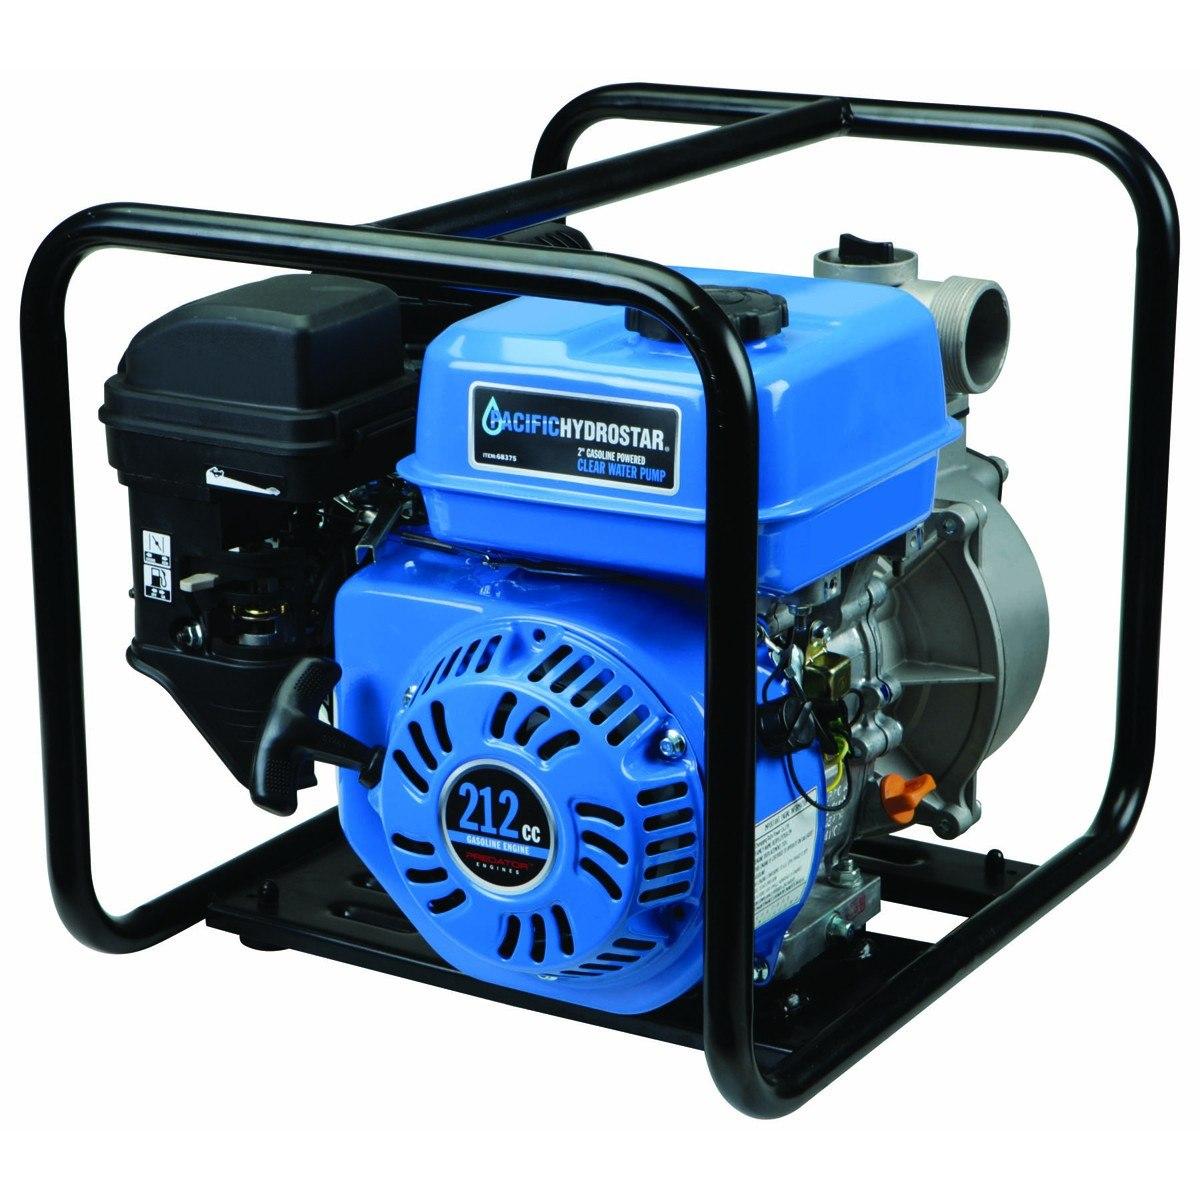 motobomba-de-agua-2-motor-gasolina-212cc-13304-MLM3039485207_082012-F